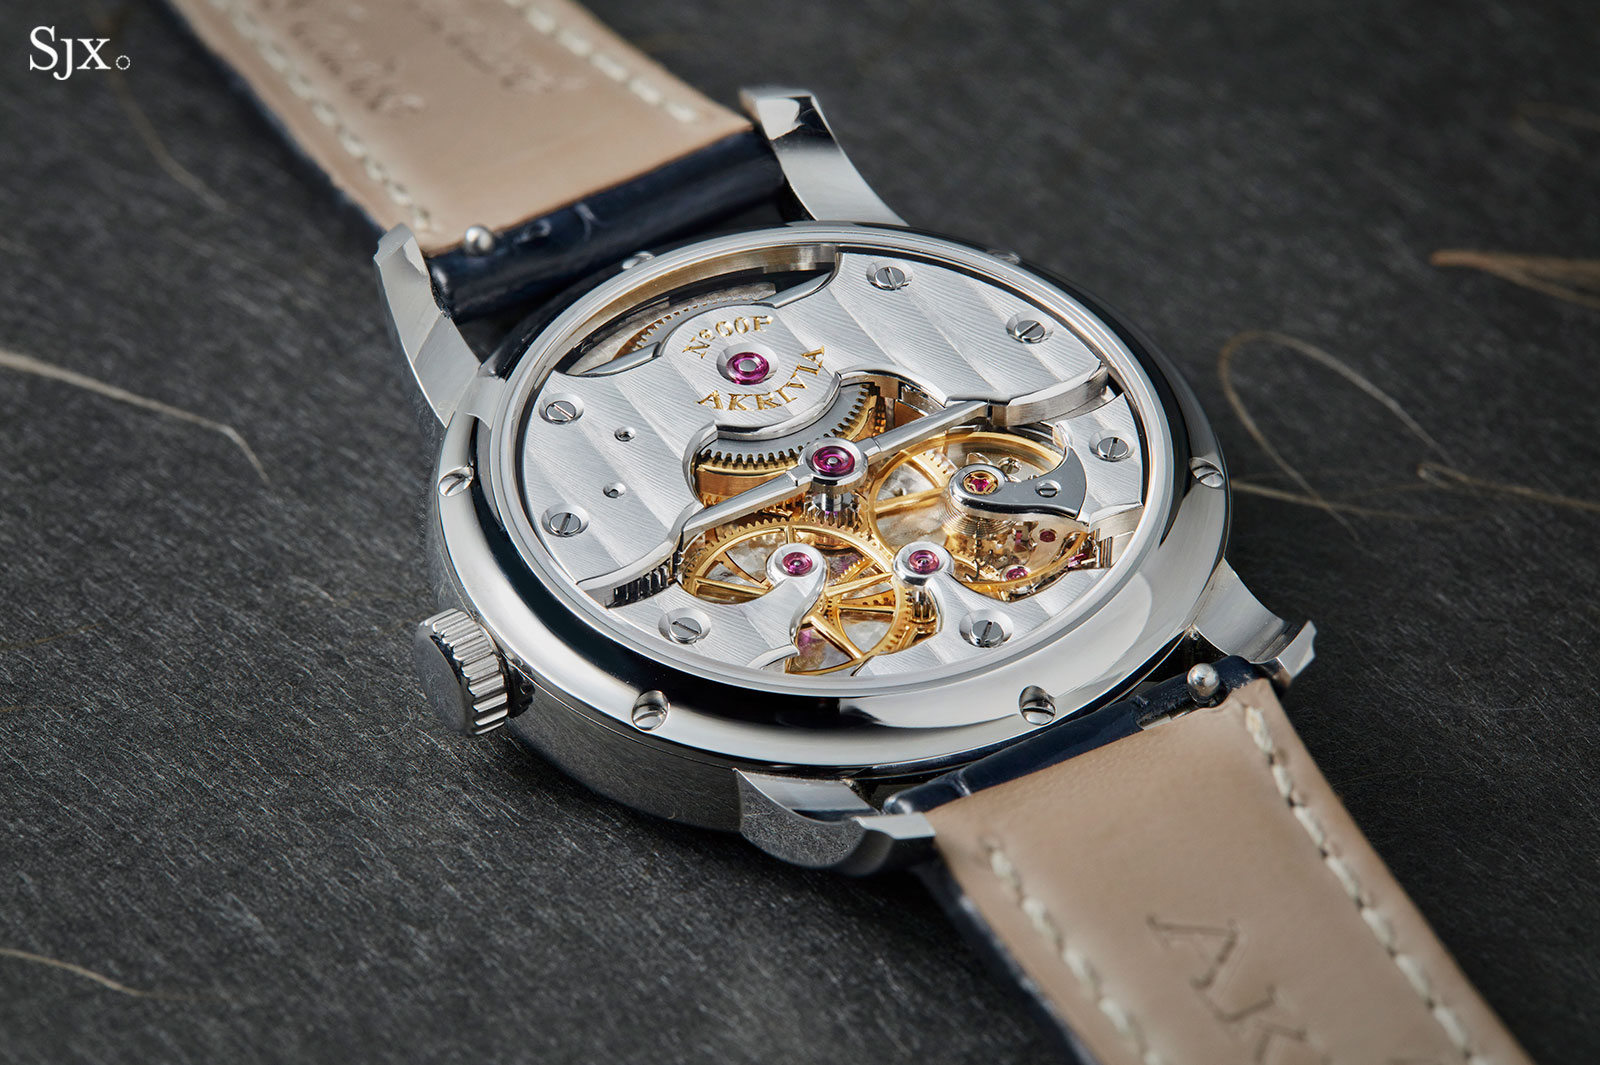 Akrivia Chronometre Contemporain Rexhep Rexhepi 16